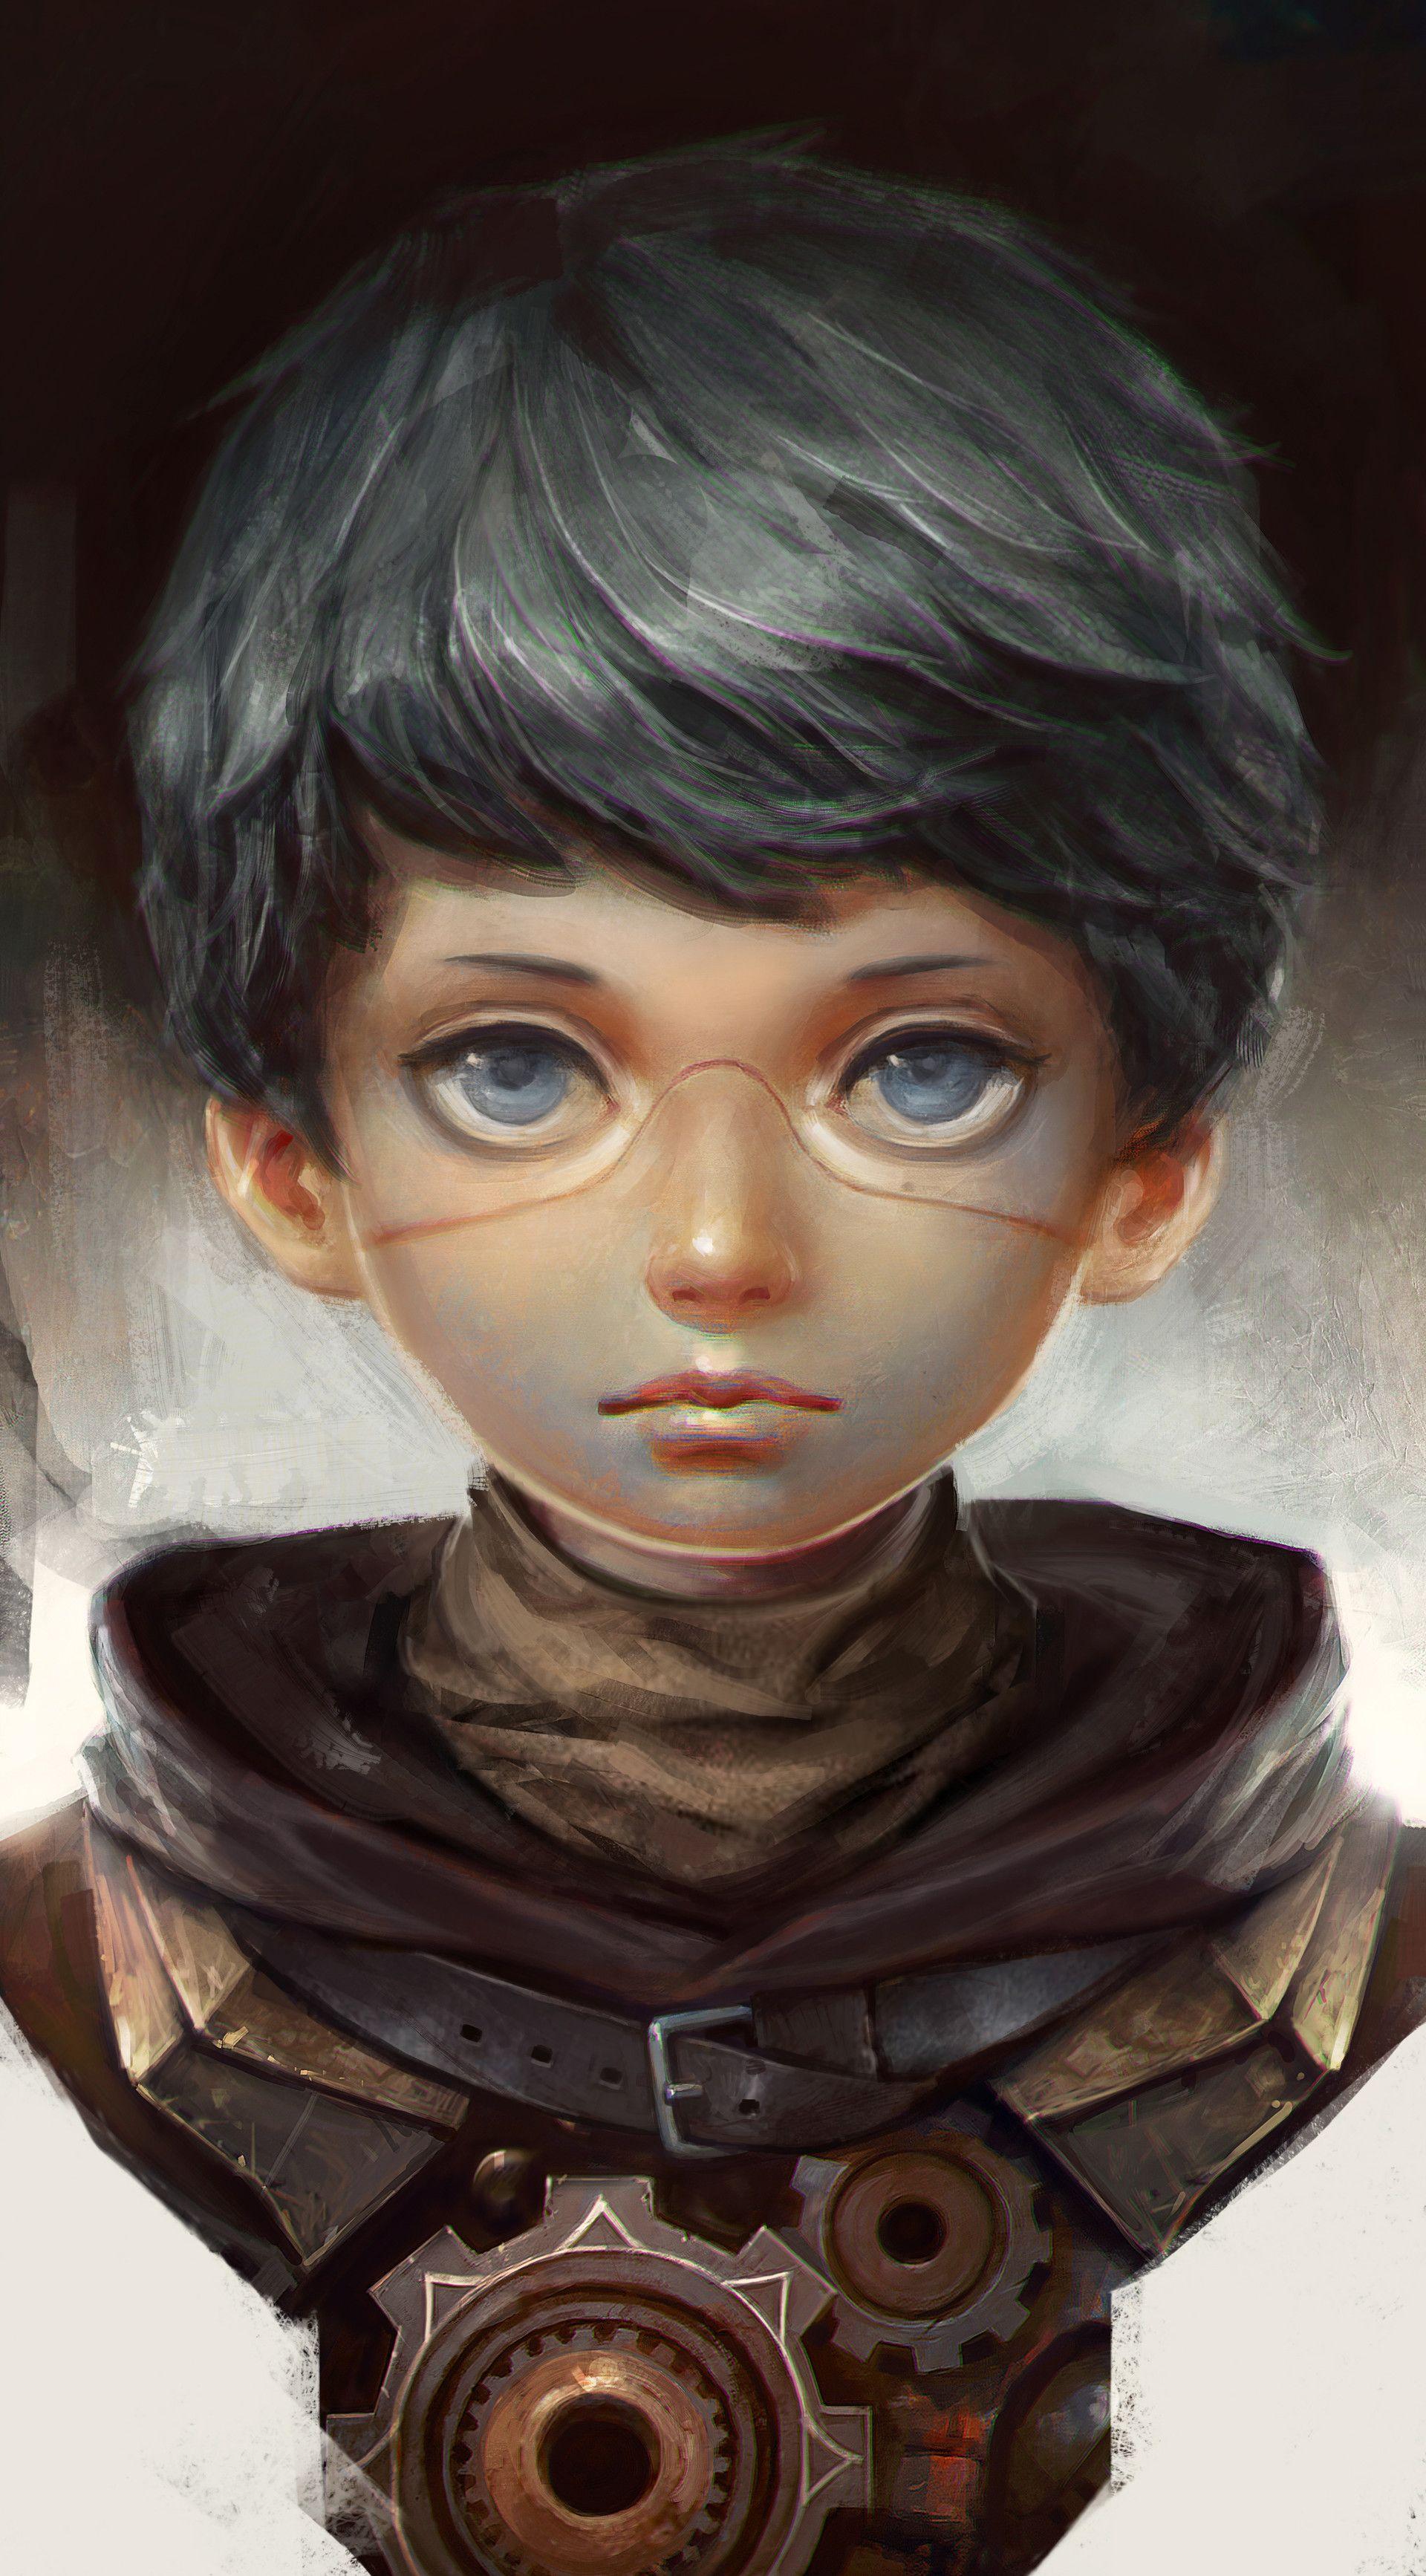 Hairstyle of boy artstation  boy yuan cui  prj robo  pinterest  character